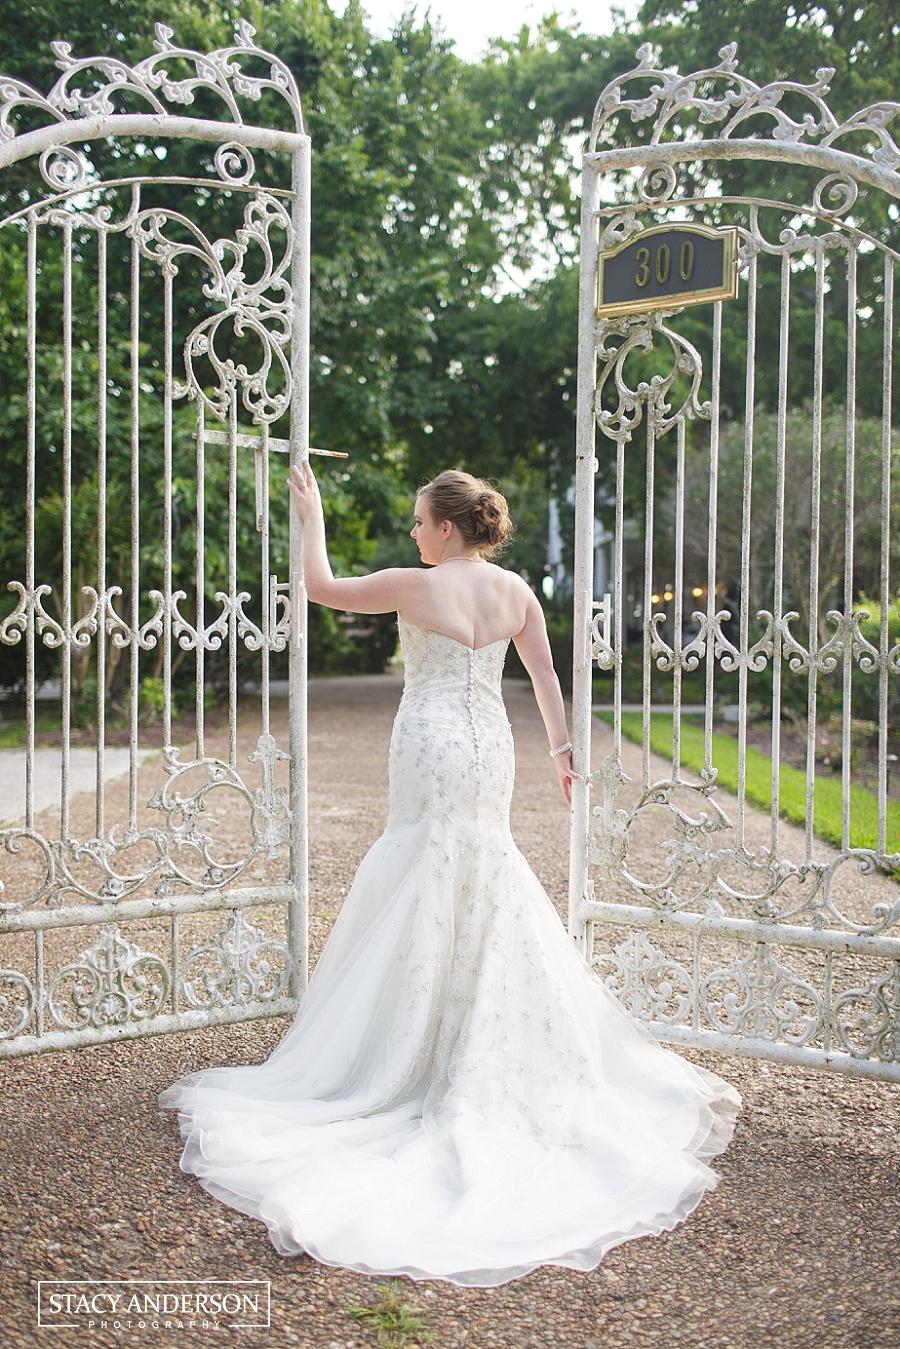 Stacy Anderson Photography Heaven on Earth Wedding Photographer_1699